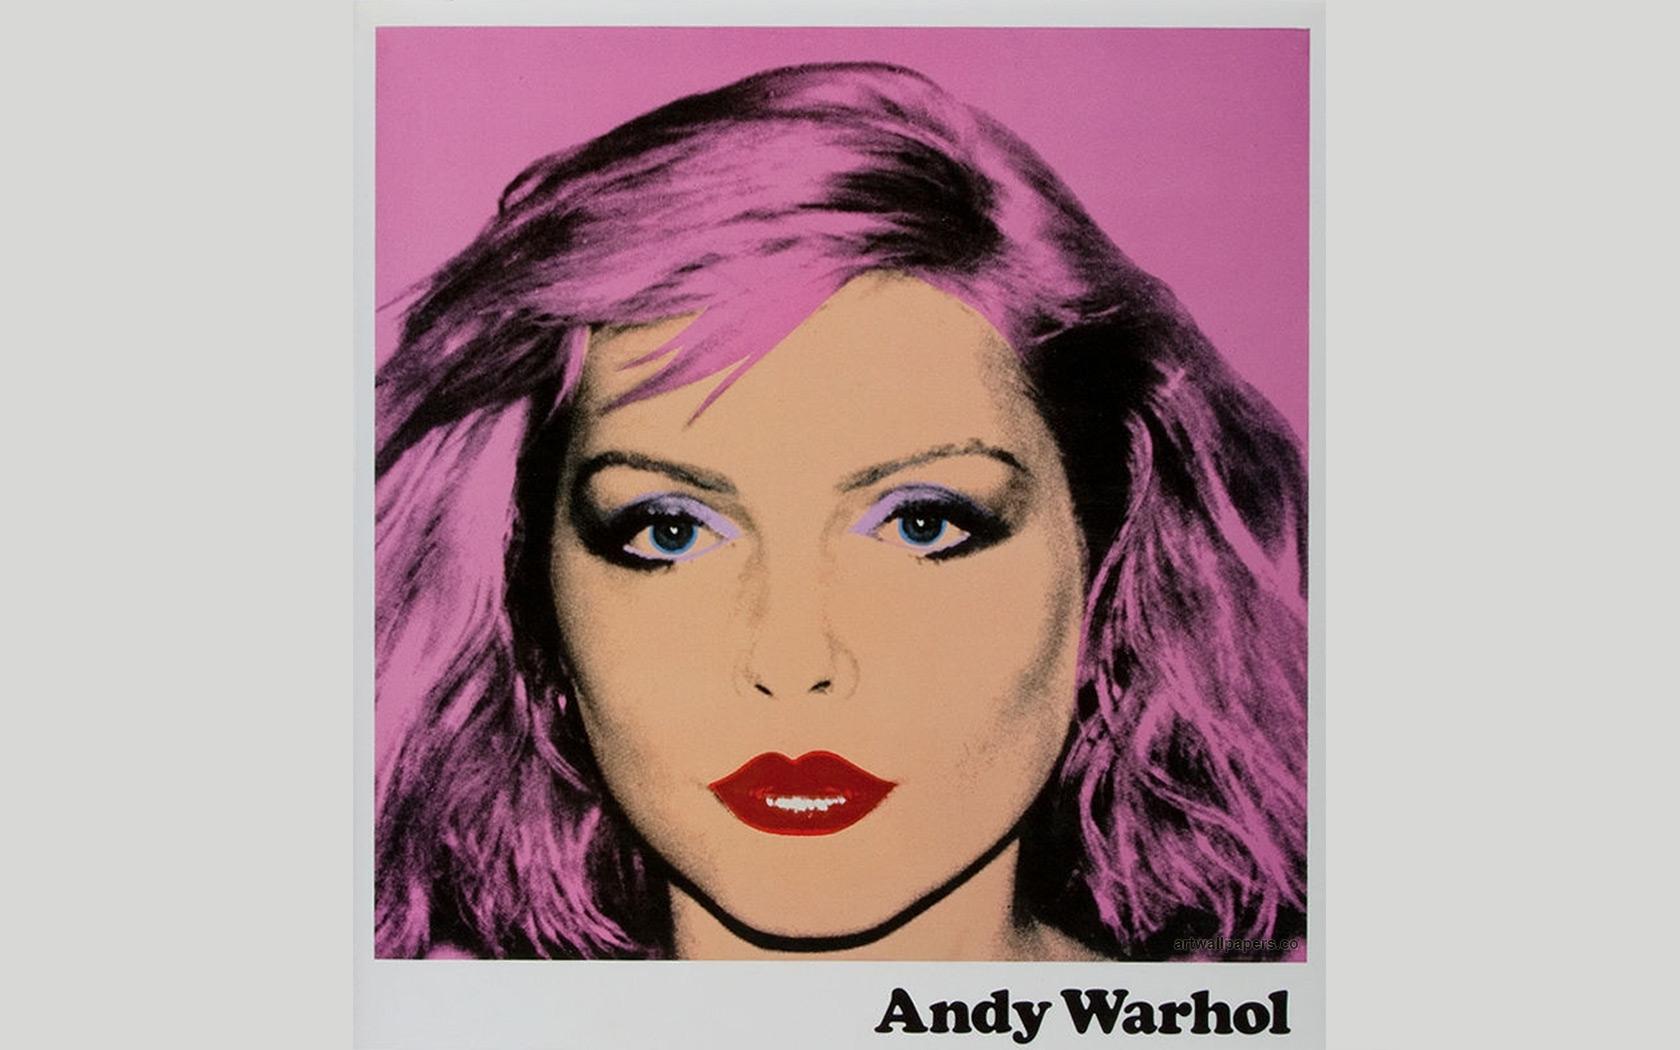 Andy Warhol Wallpapers Desktop Art Backgrounds 1680x1050